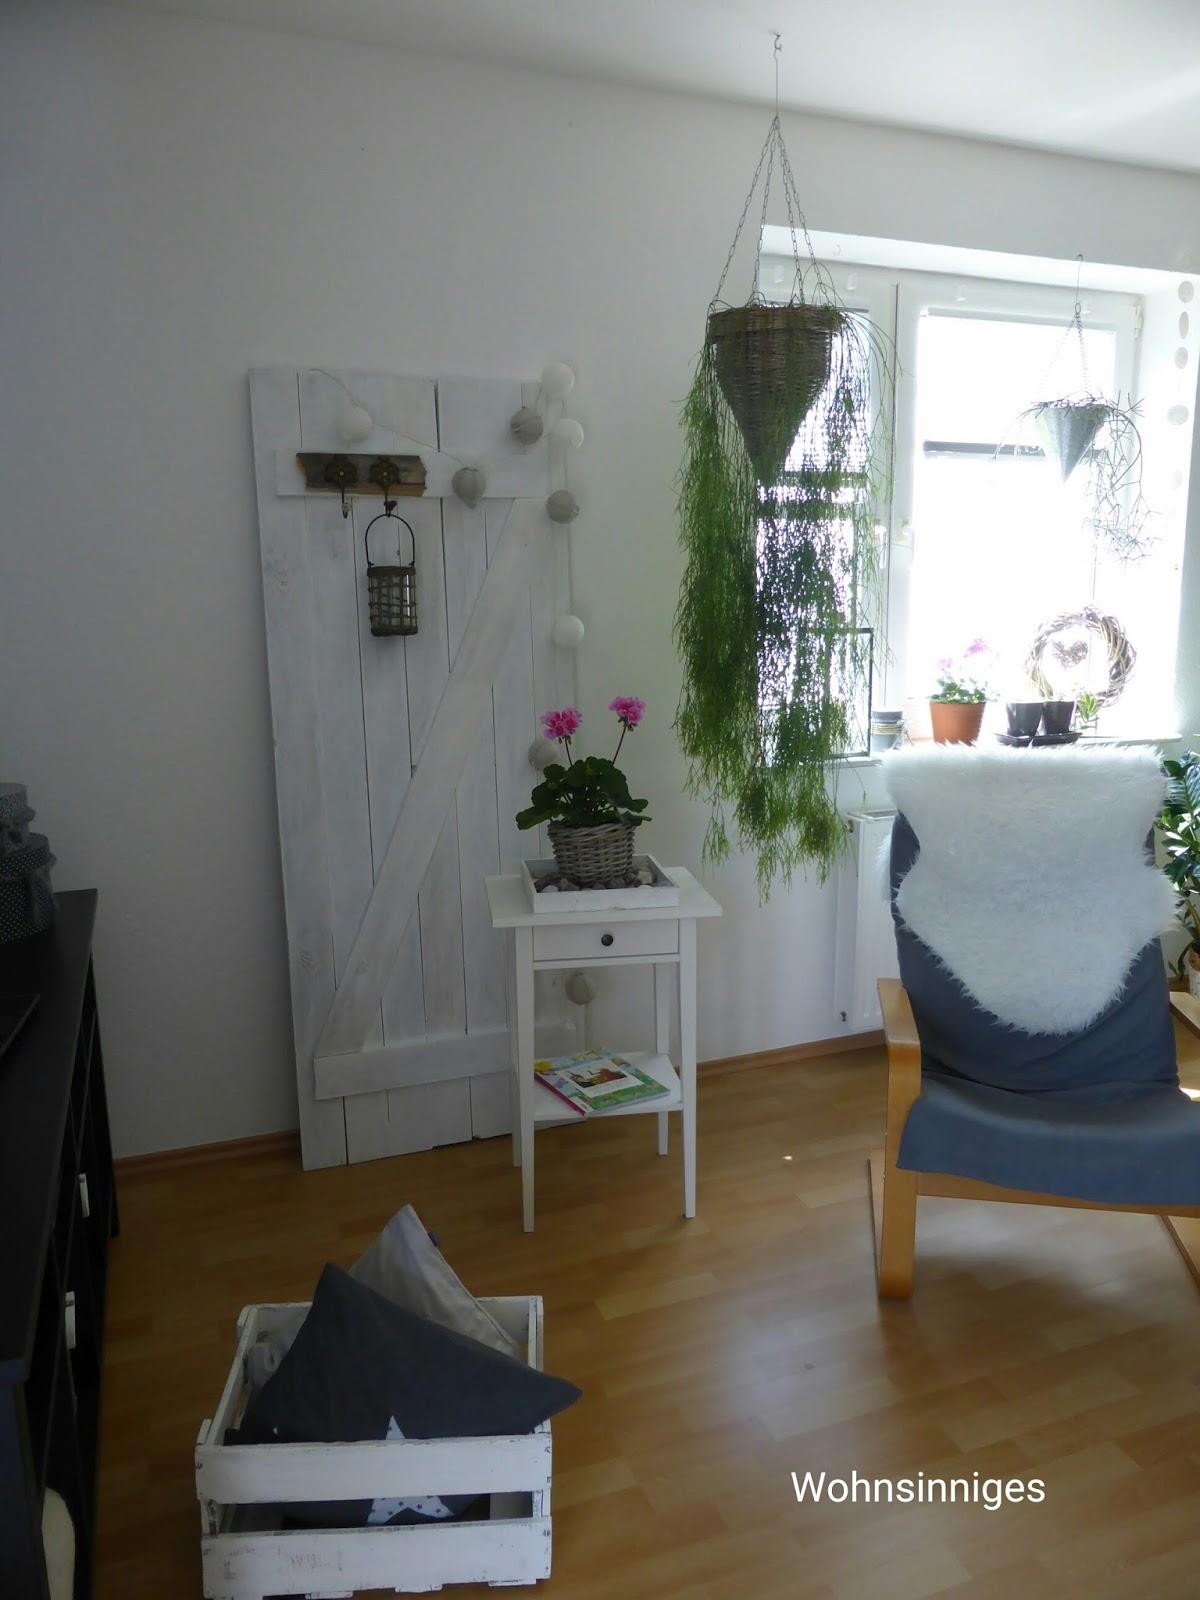 wohnsinniges t r diy. Black Bedroom Furniture Sets. Home Design Ideas